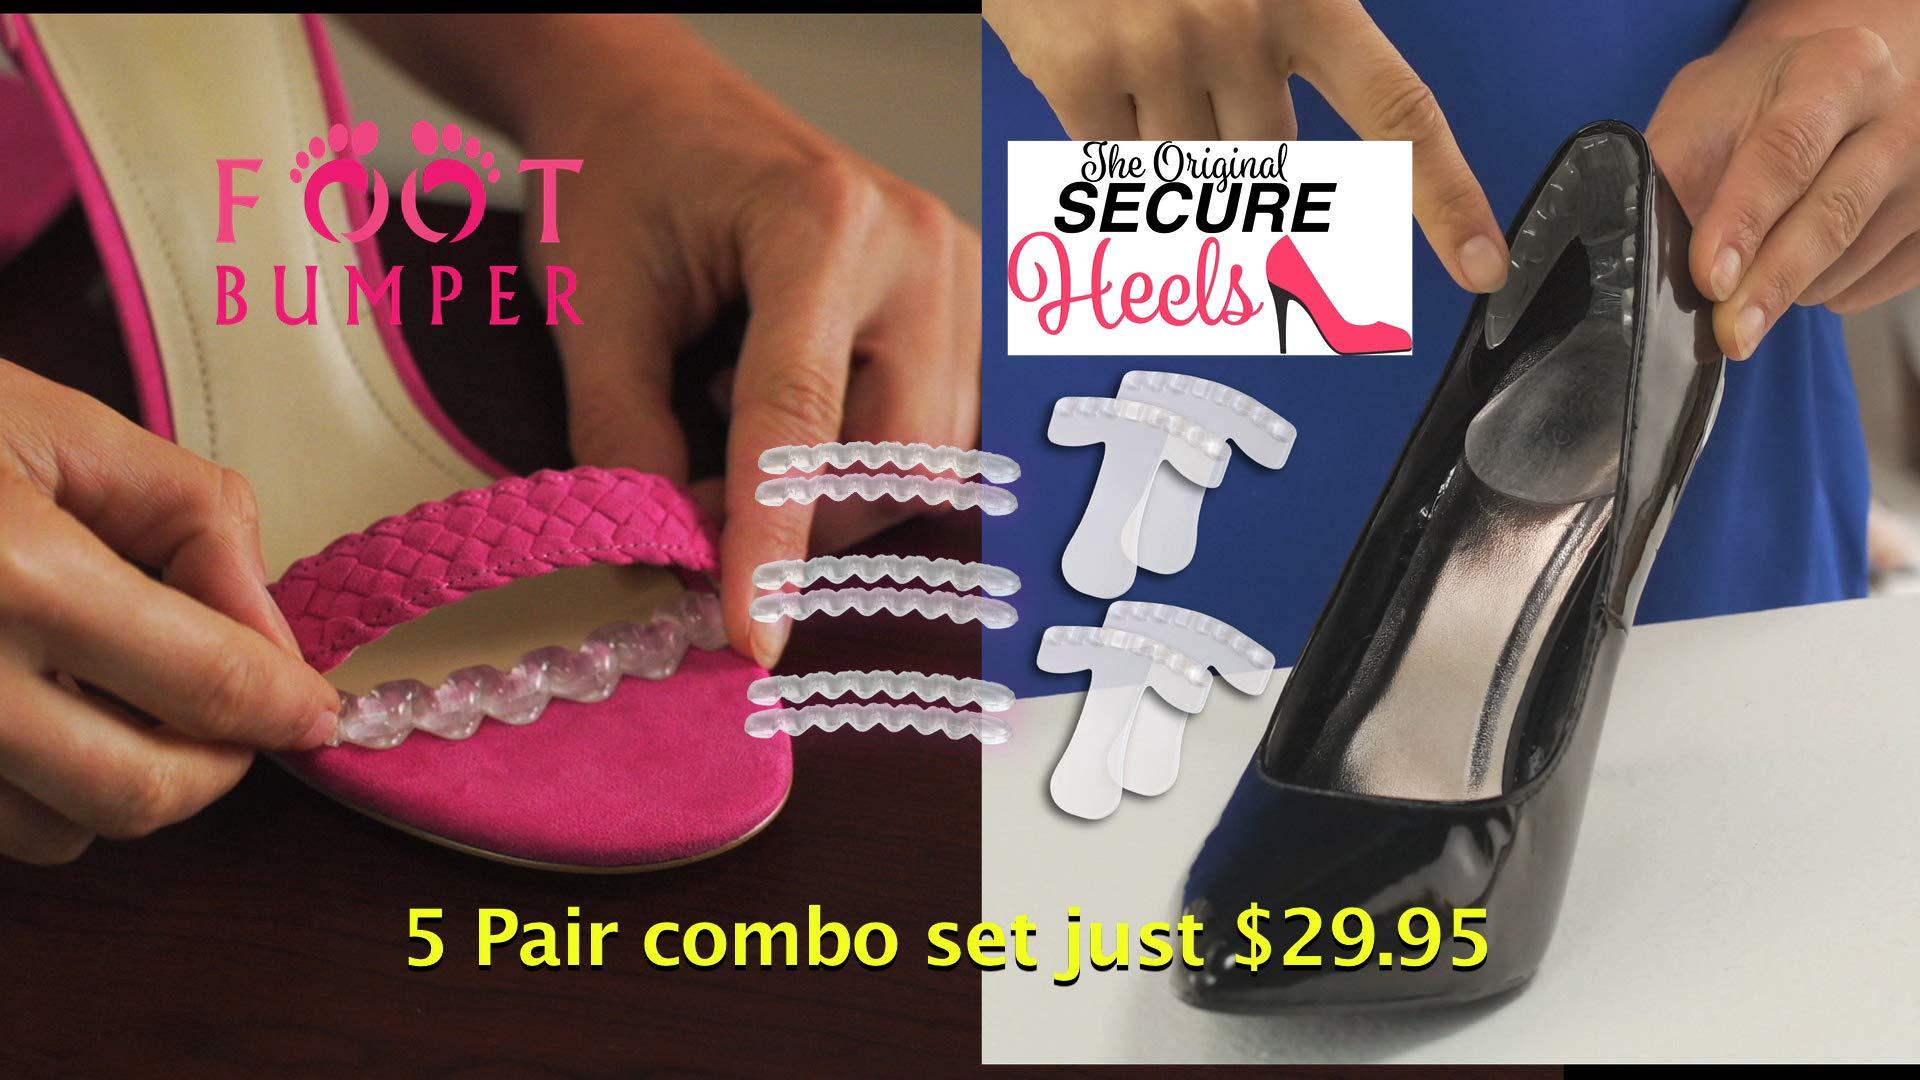 Foot Bumper & Secure Heels Comfort Solution. by SECURE HEELS